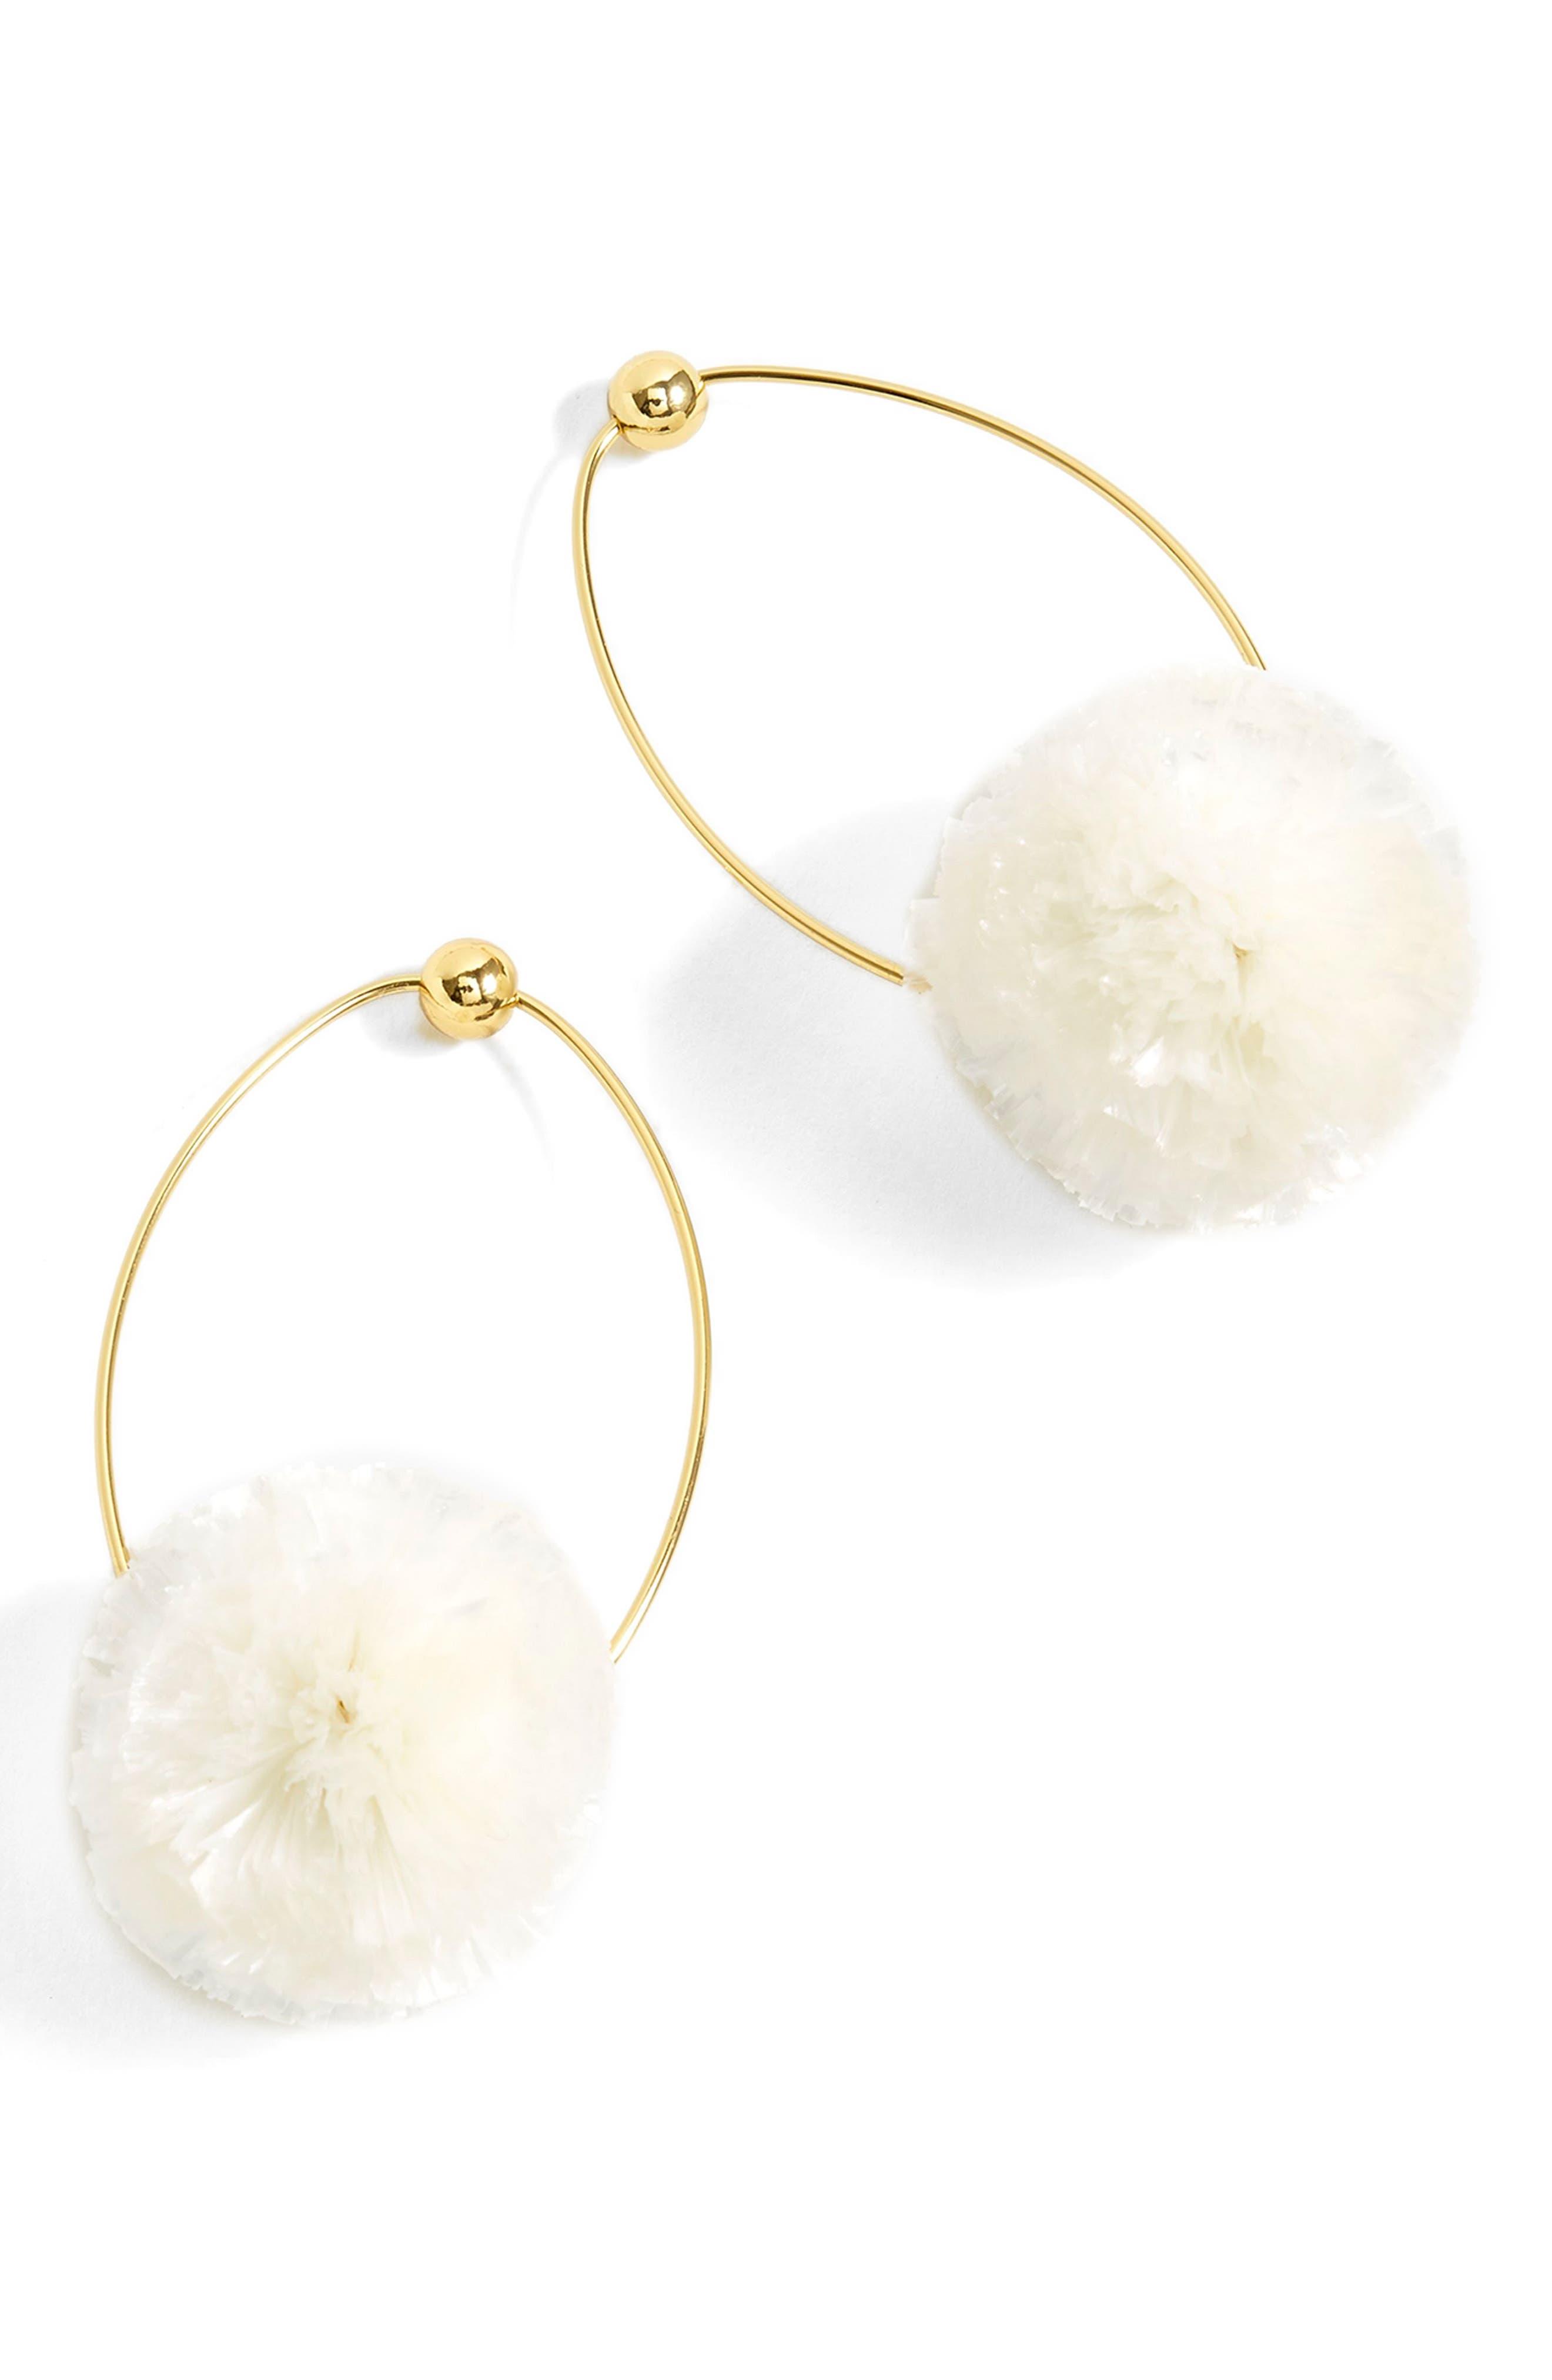 Dandy Drop Earrings,                         Main,                         color,